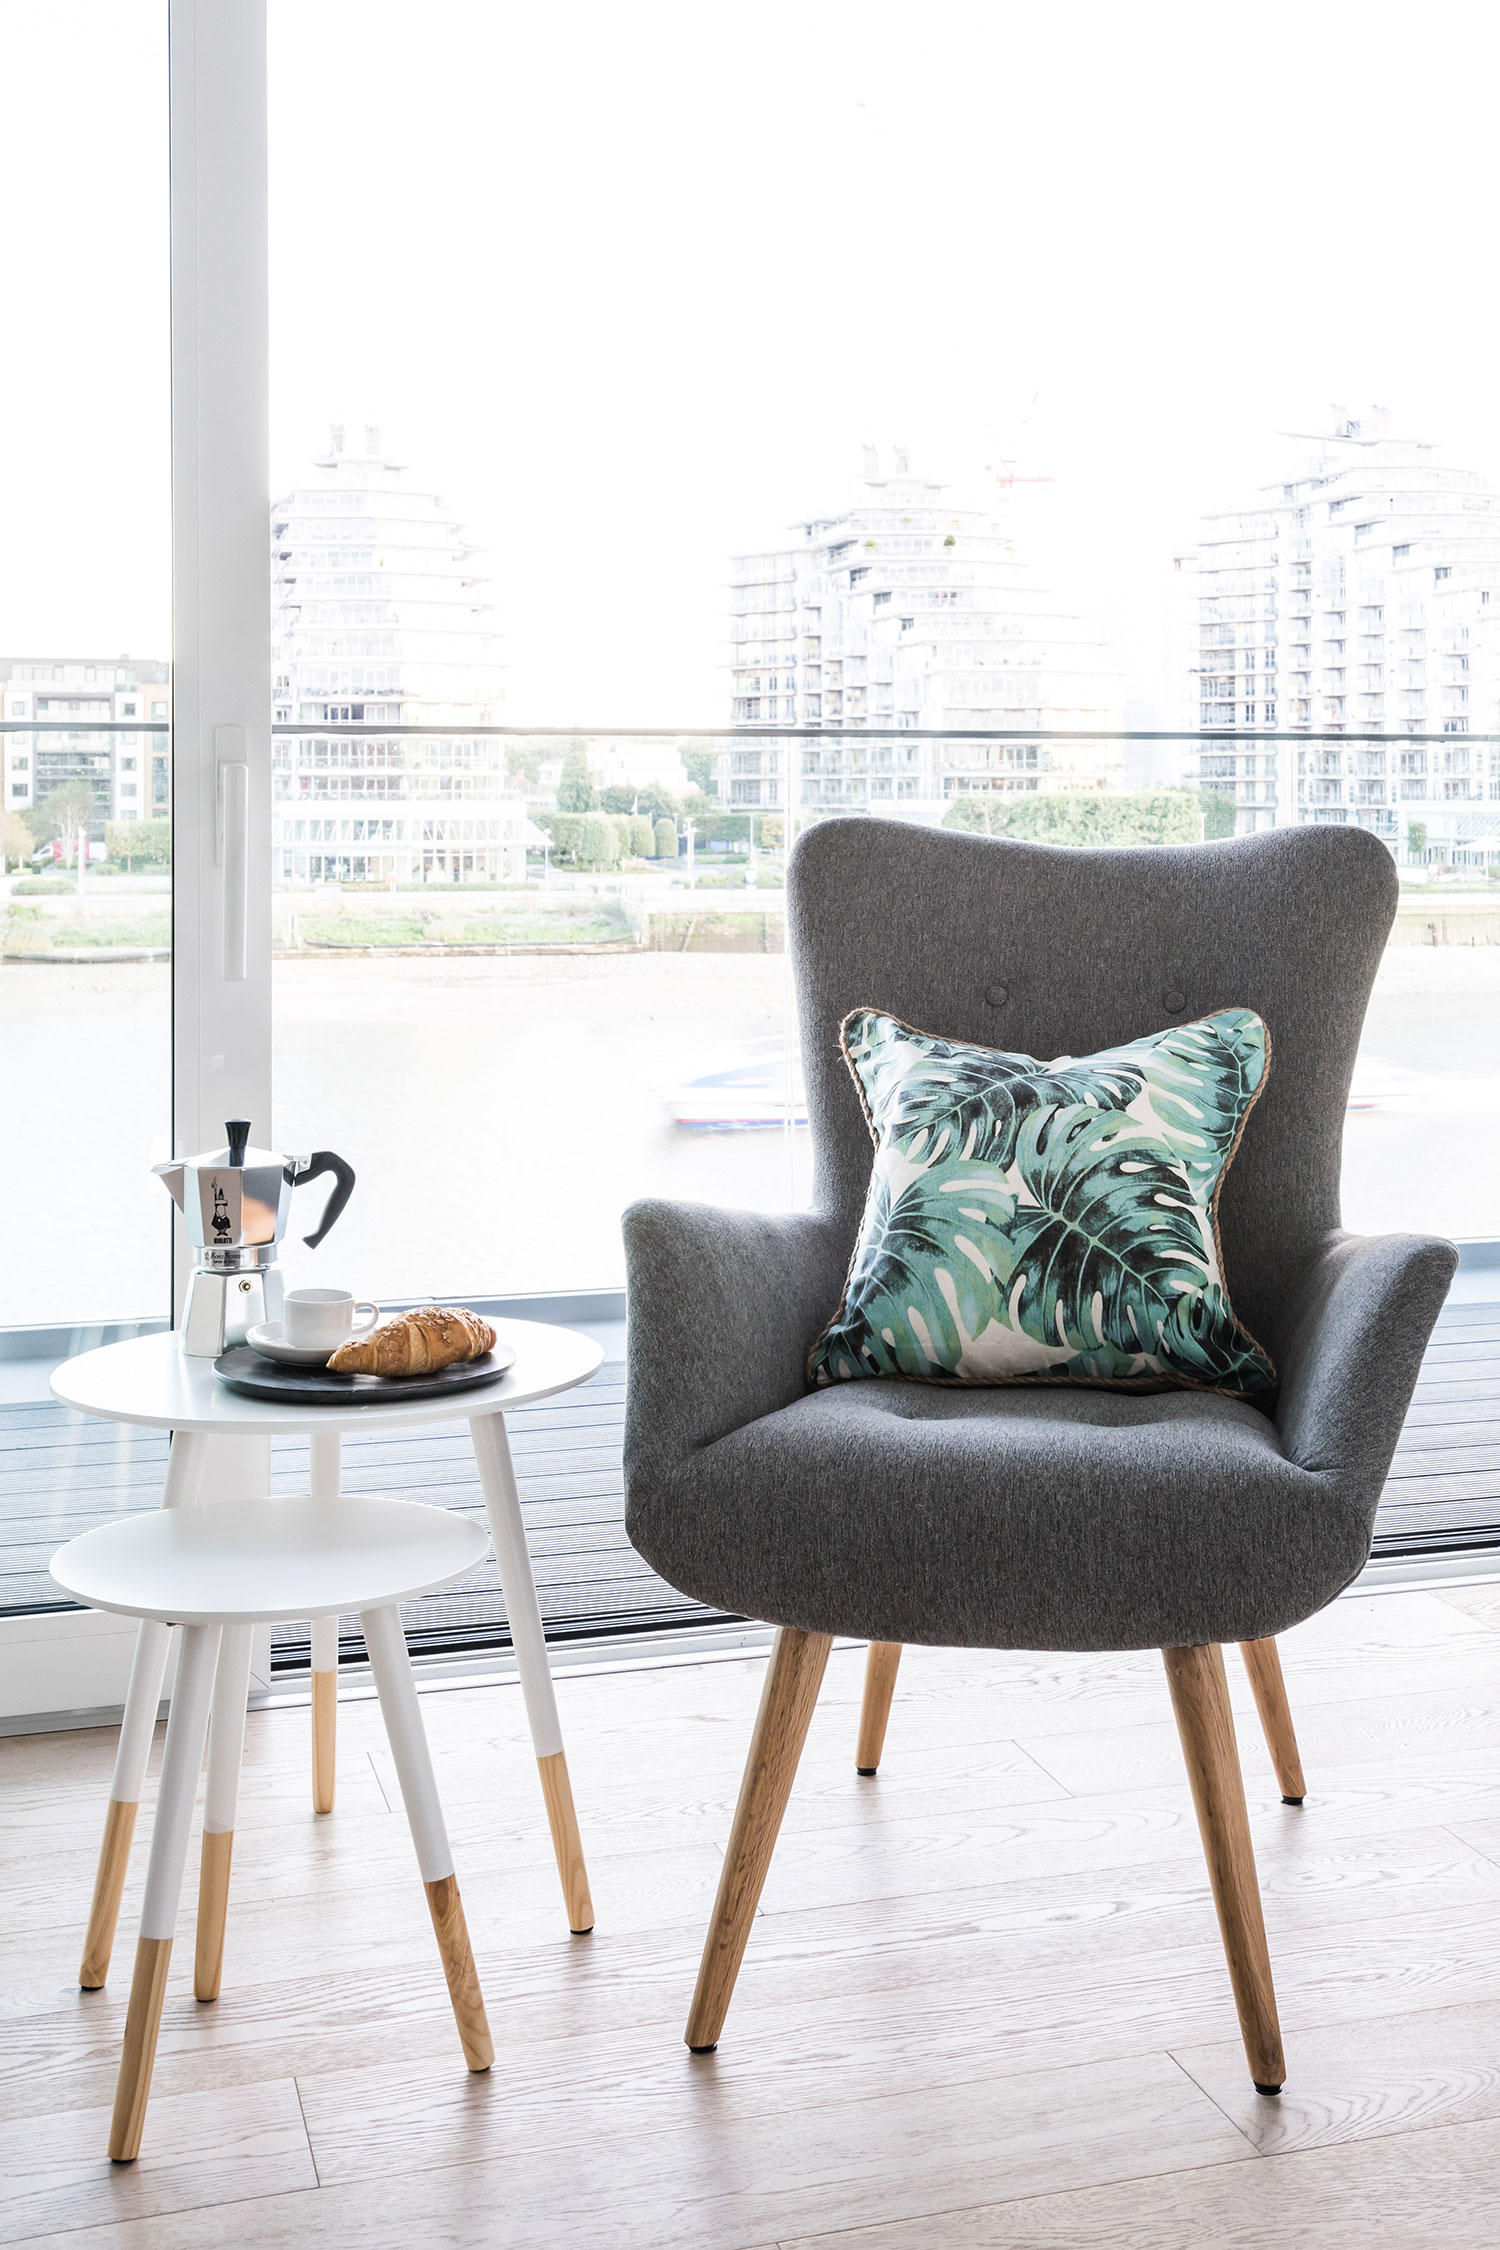 BoxNine7_Fulham_Riverside_S_007_Living_Room_Entrance_Area_Sitting_Room.jpg